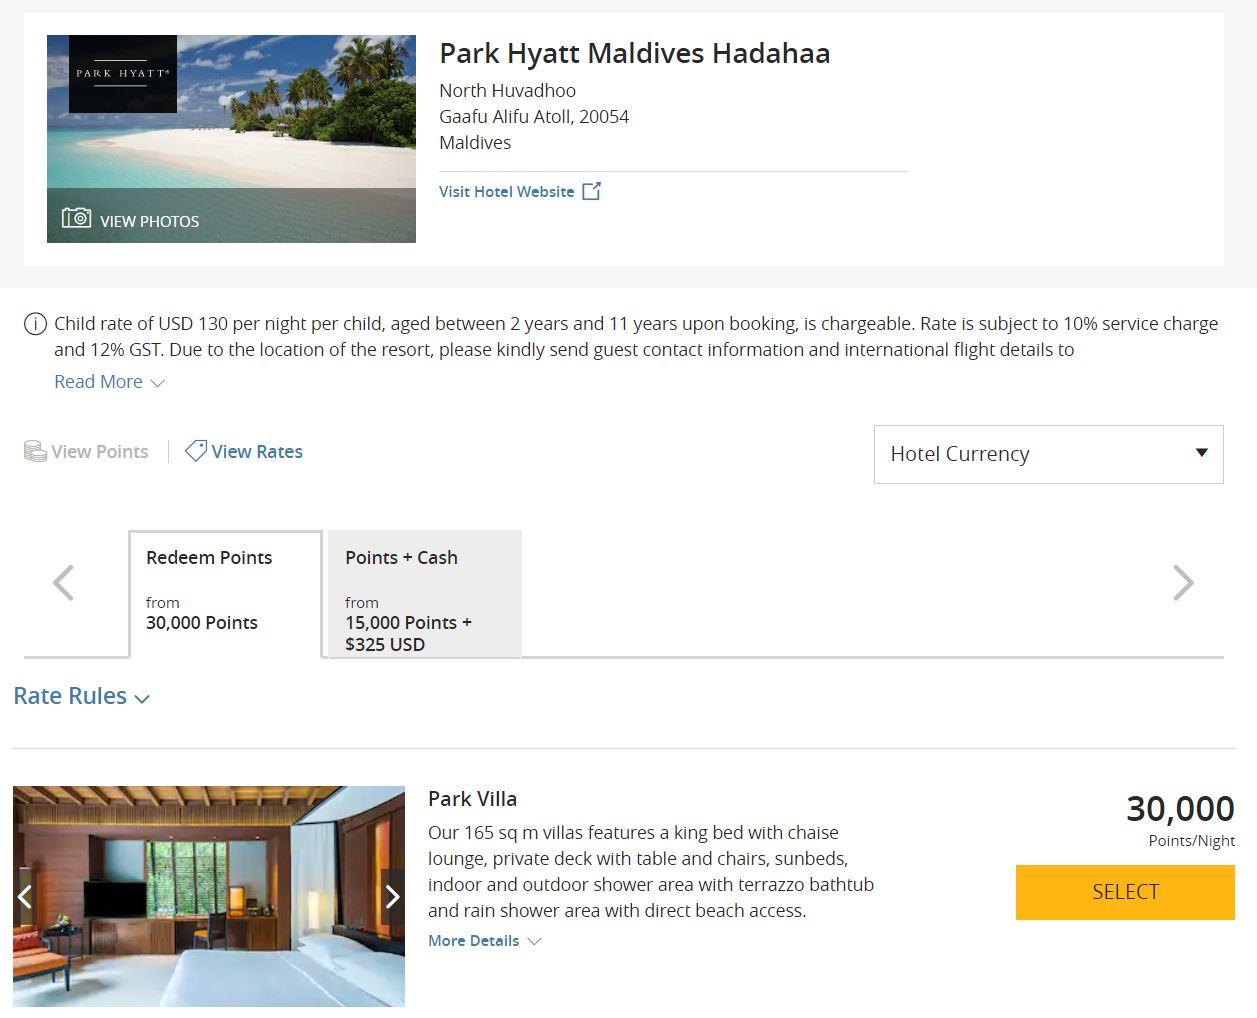 image via  hyatt.com/shop/mldph?location=Park%20Hyatt%20Maldives%20Hadahaa&checkinDate=2019-12-11&checkoutDate=2019-12-12